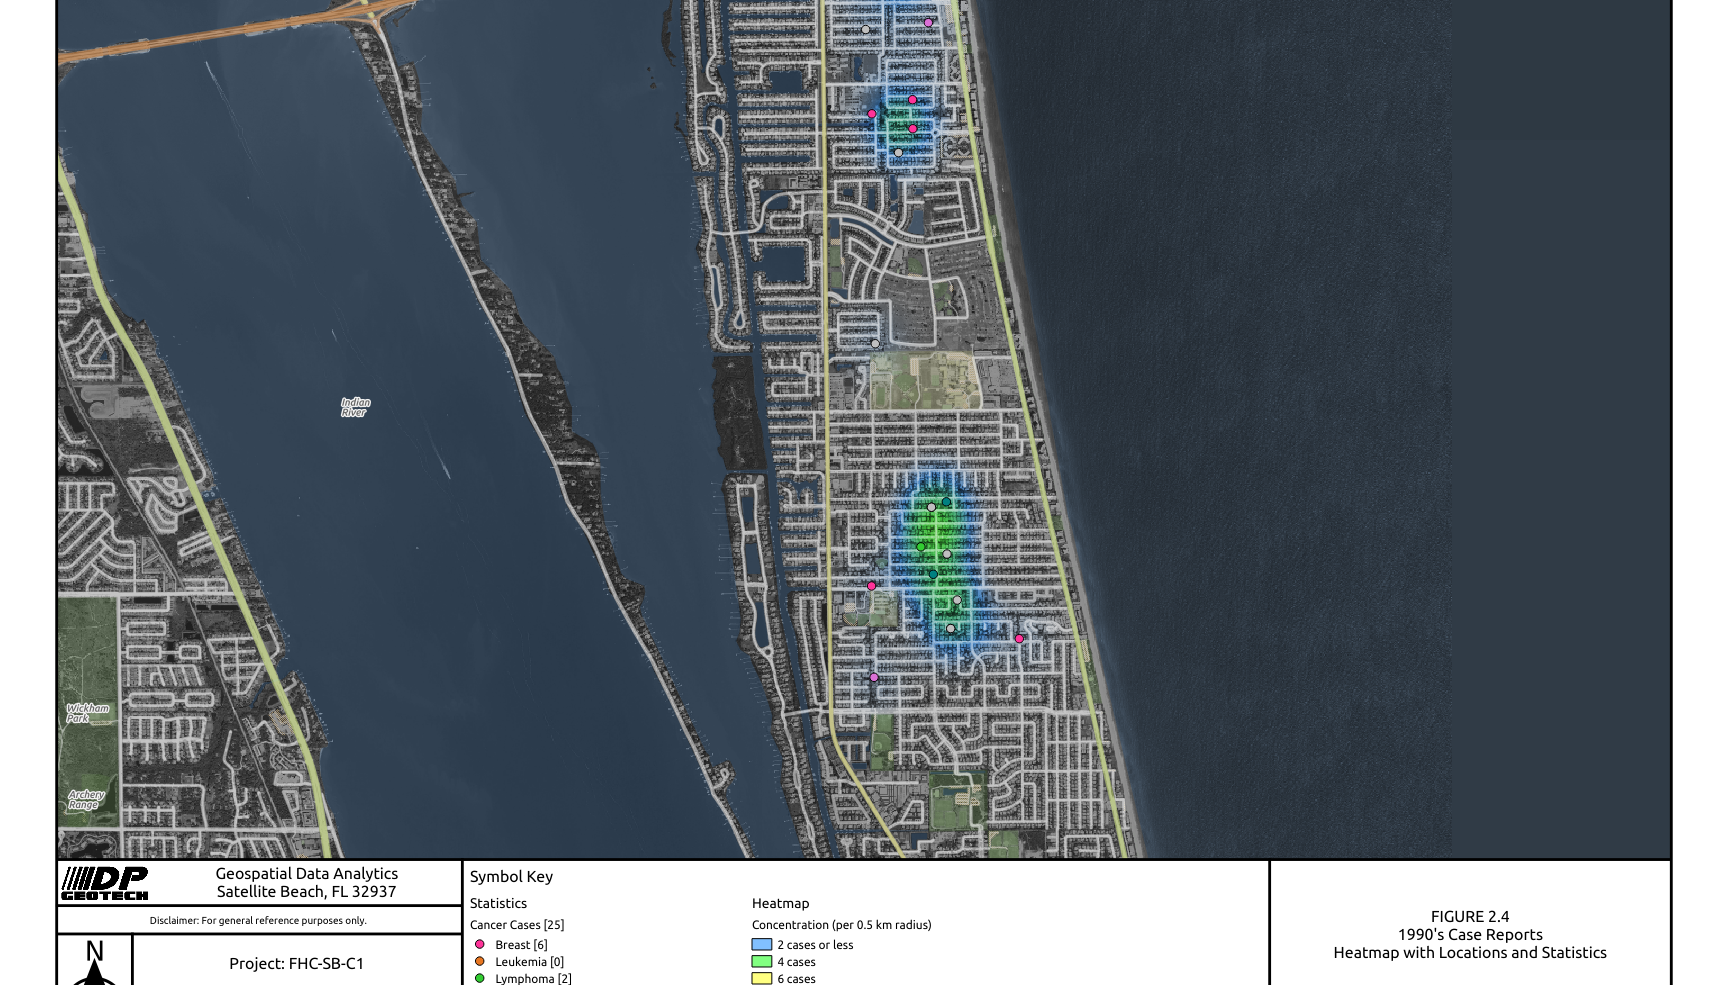 1990 Satellite Beach Cancer Cases Heat Map